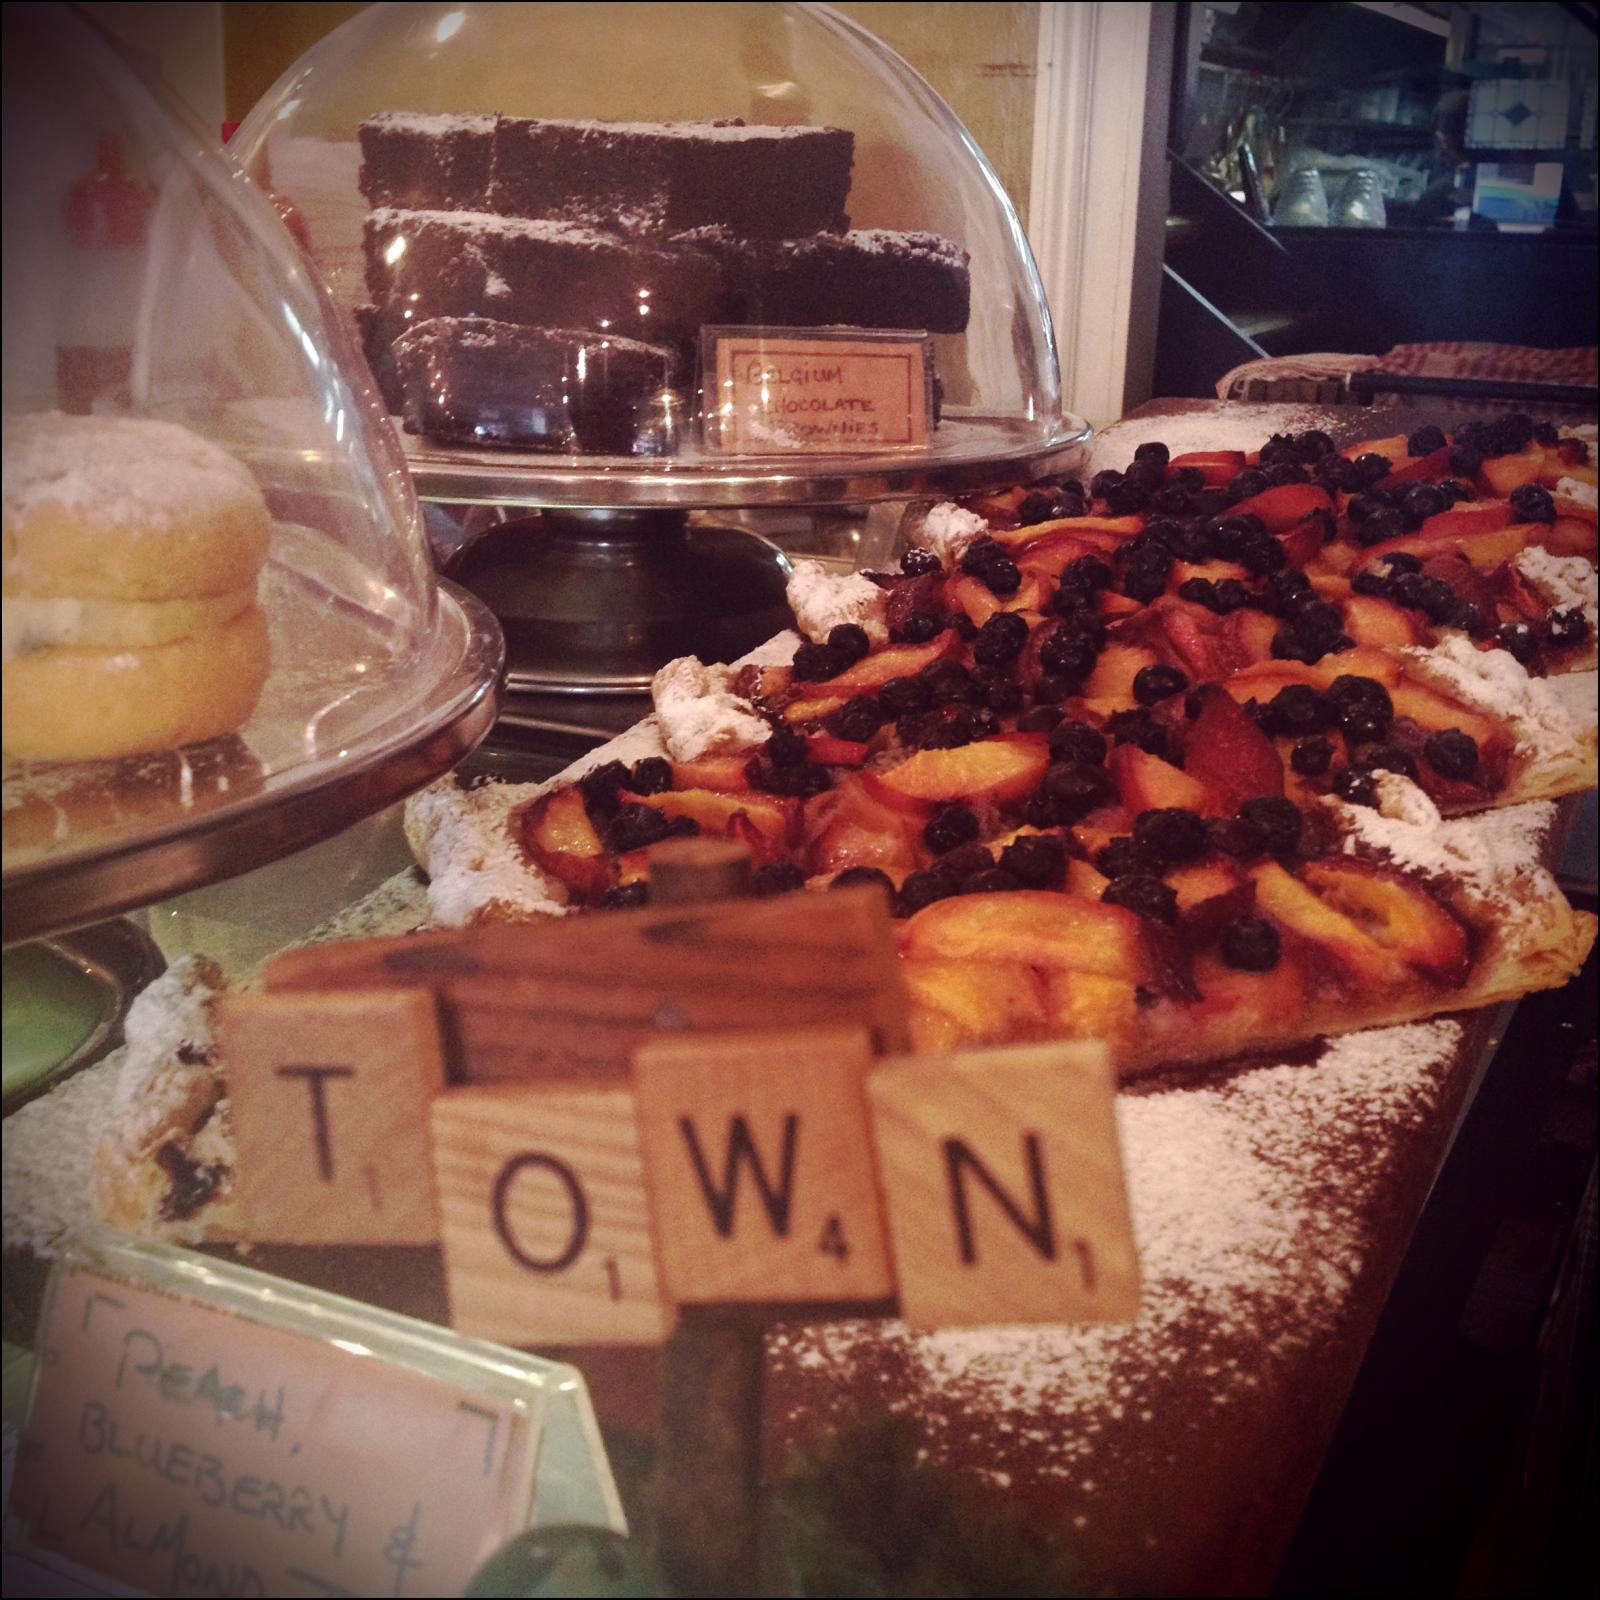 town cafe bangalow copy.jpg